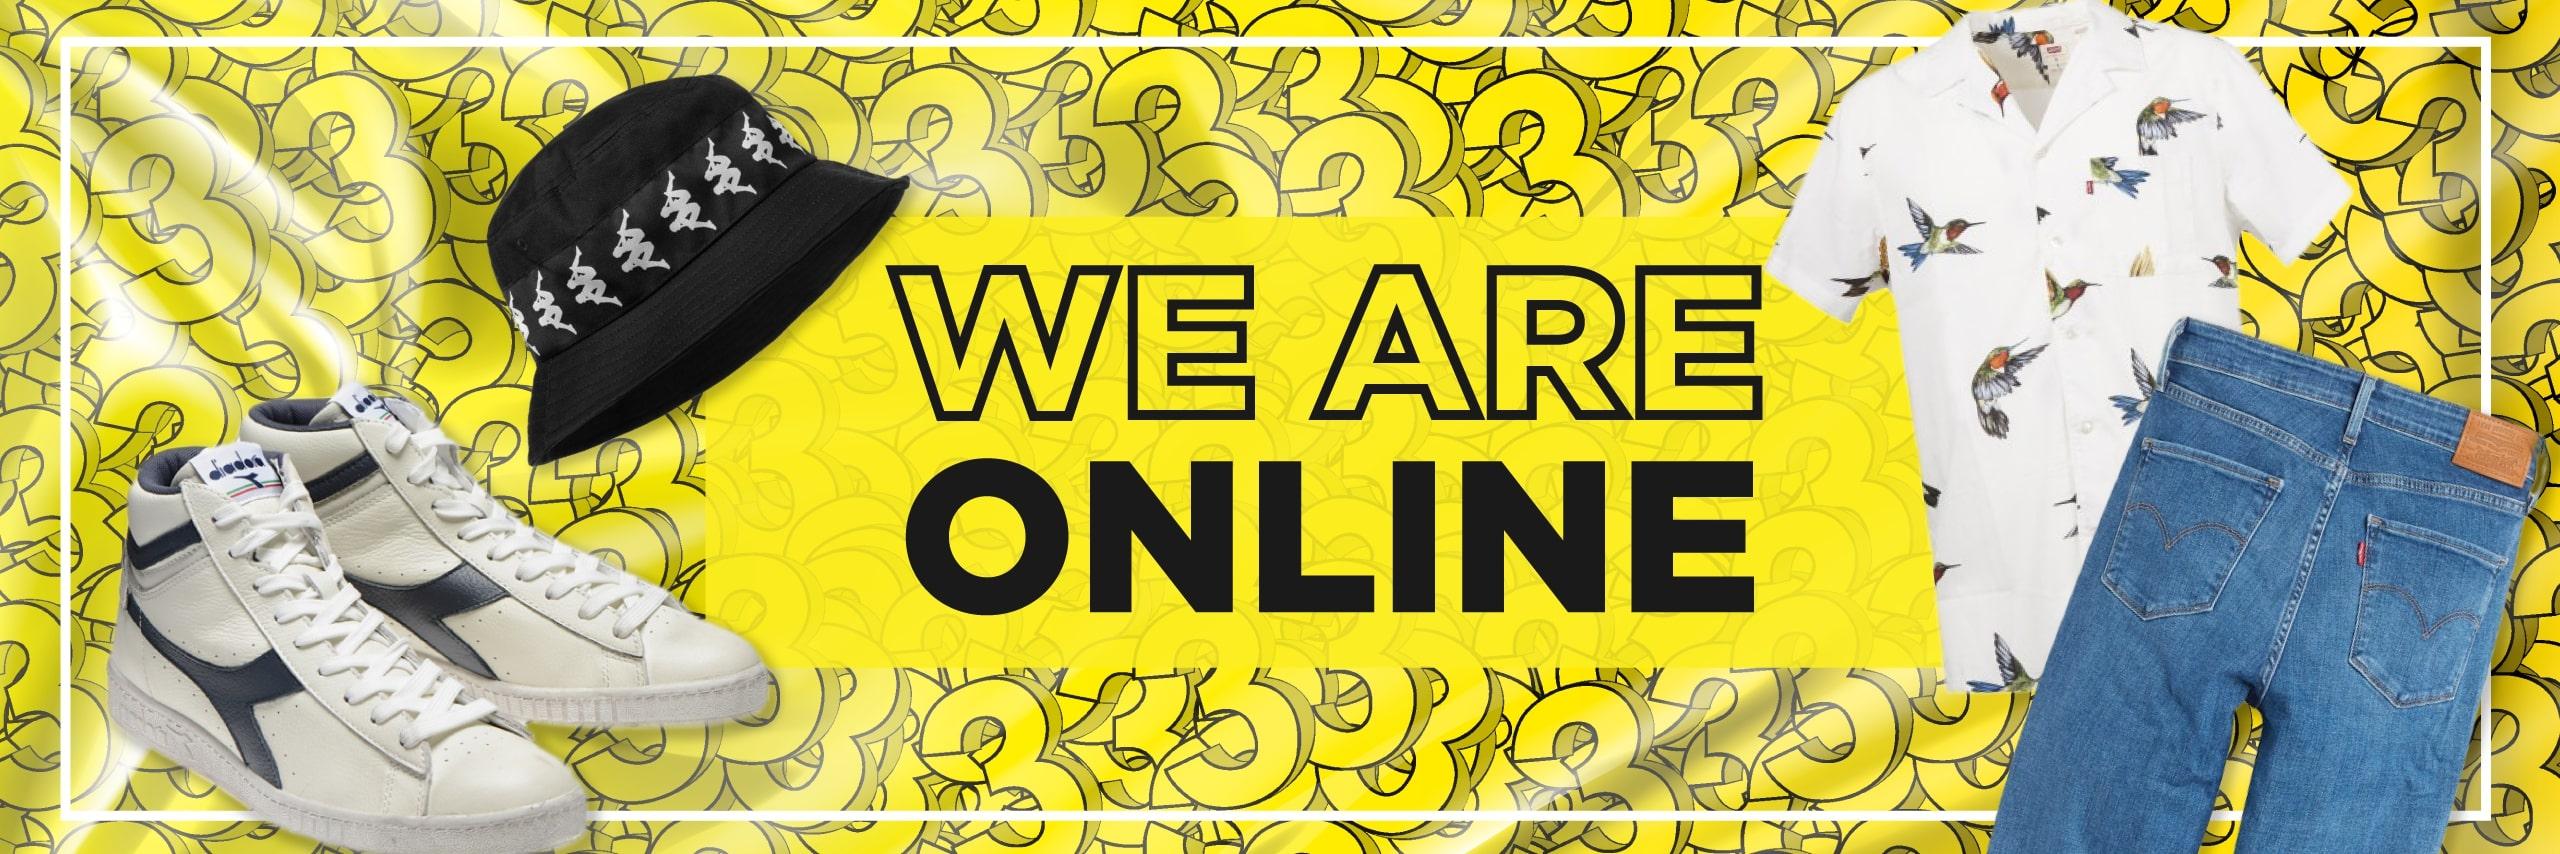 Siamo online con TrePuntoZero Shop